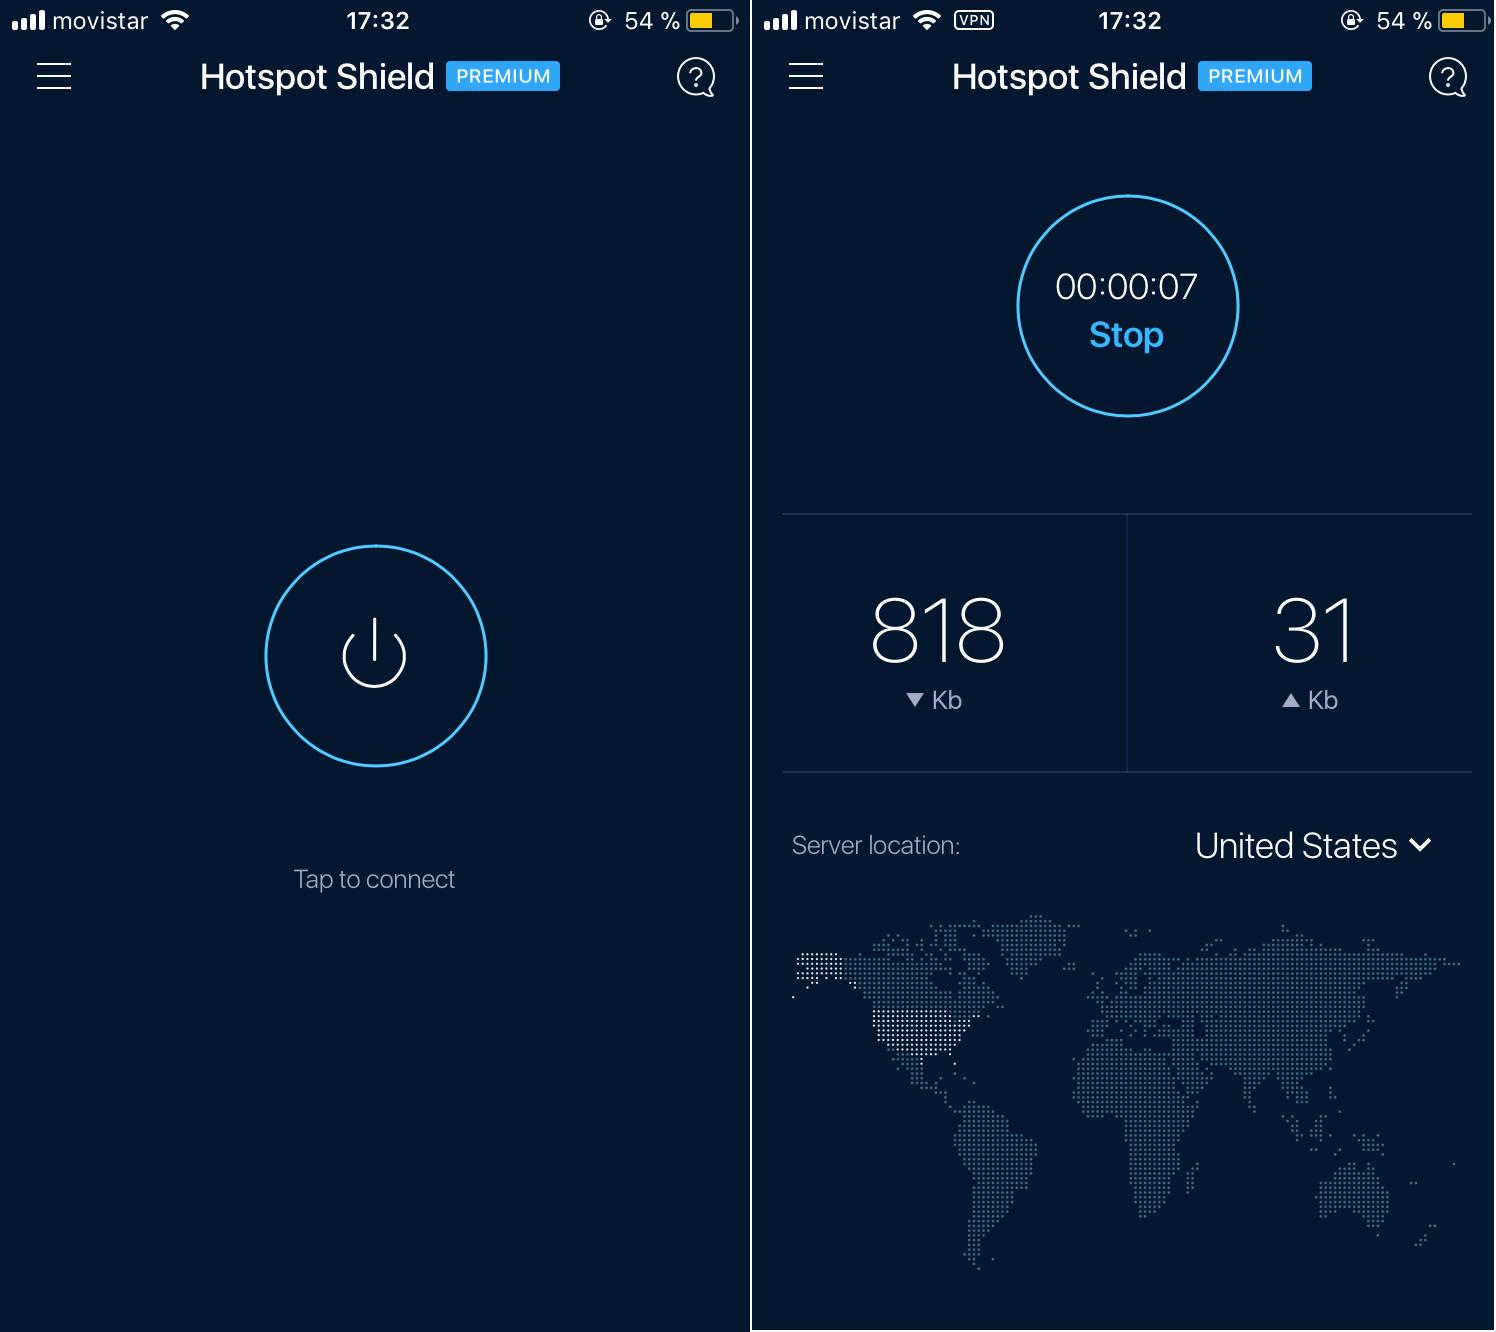 descargar hotspot shield vpn gratis para iphone free elite full